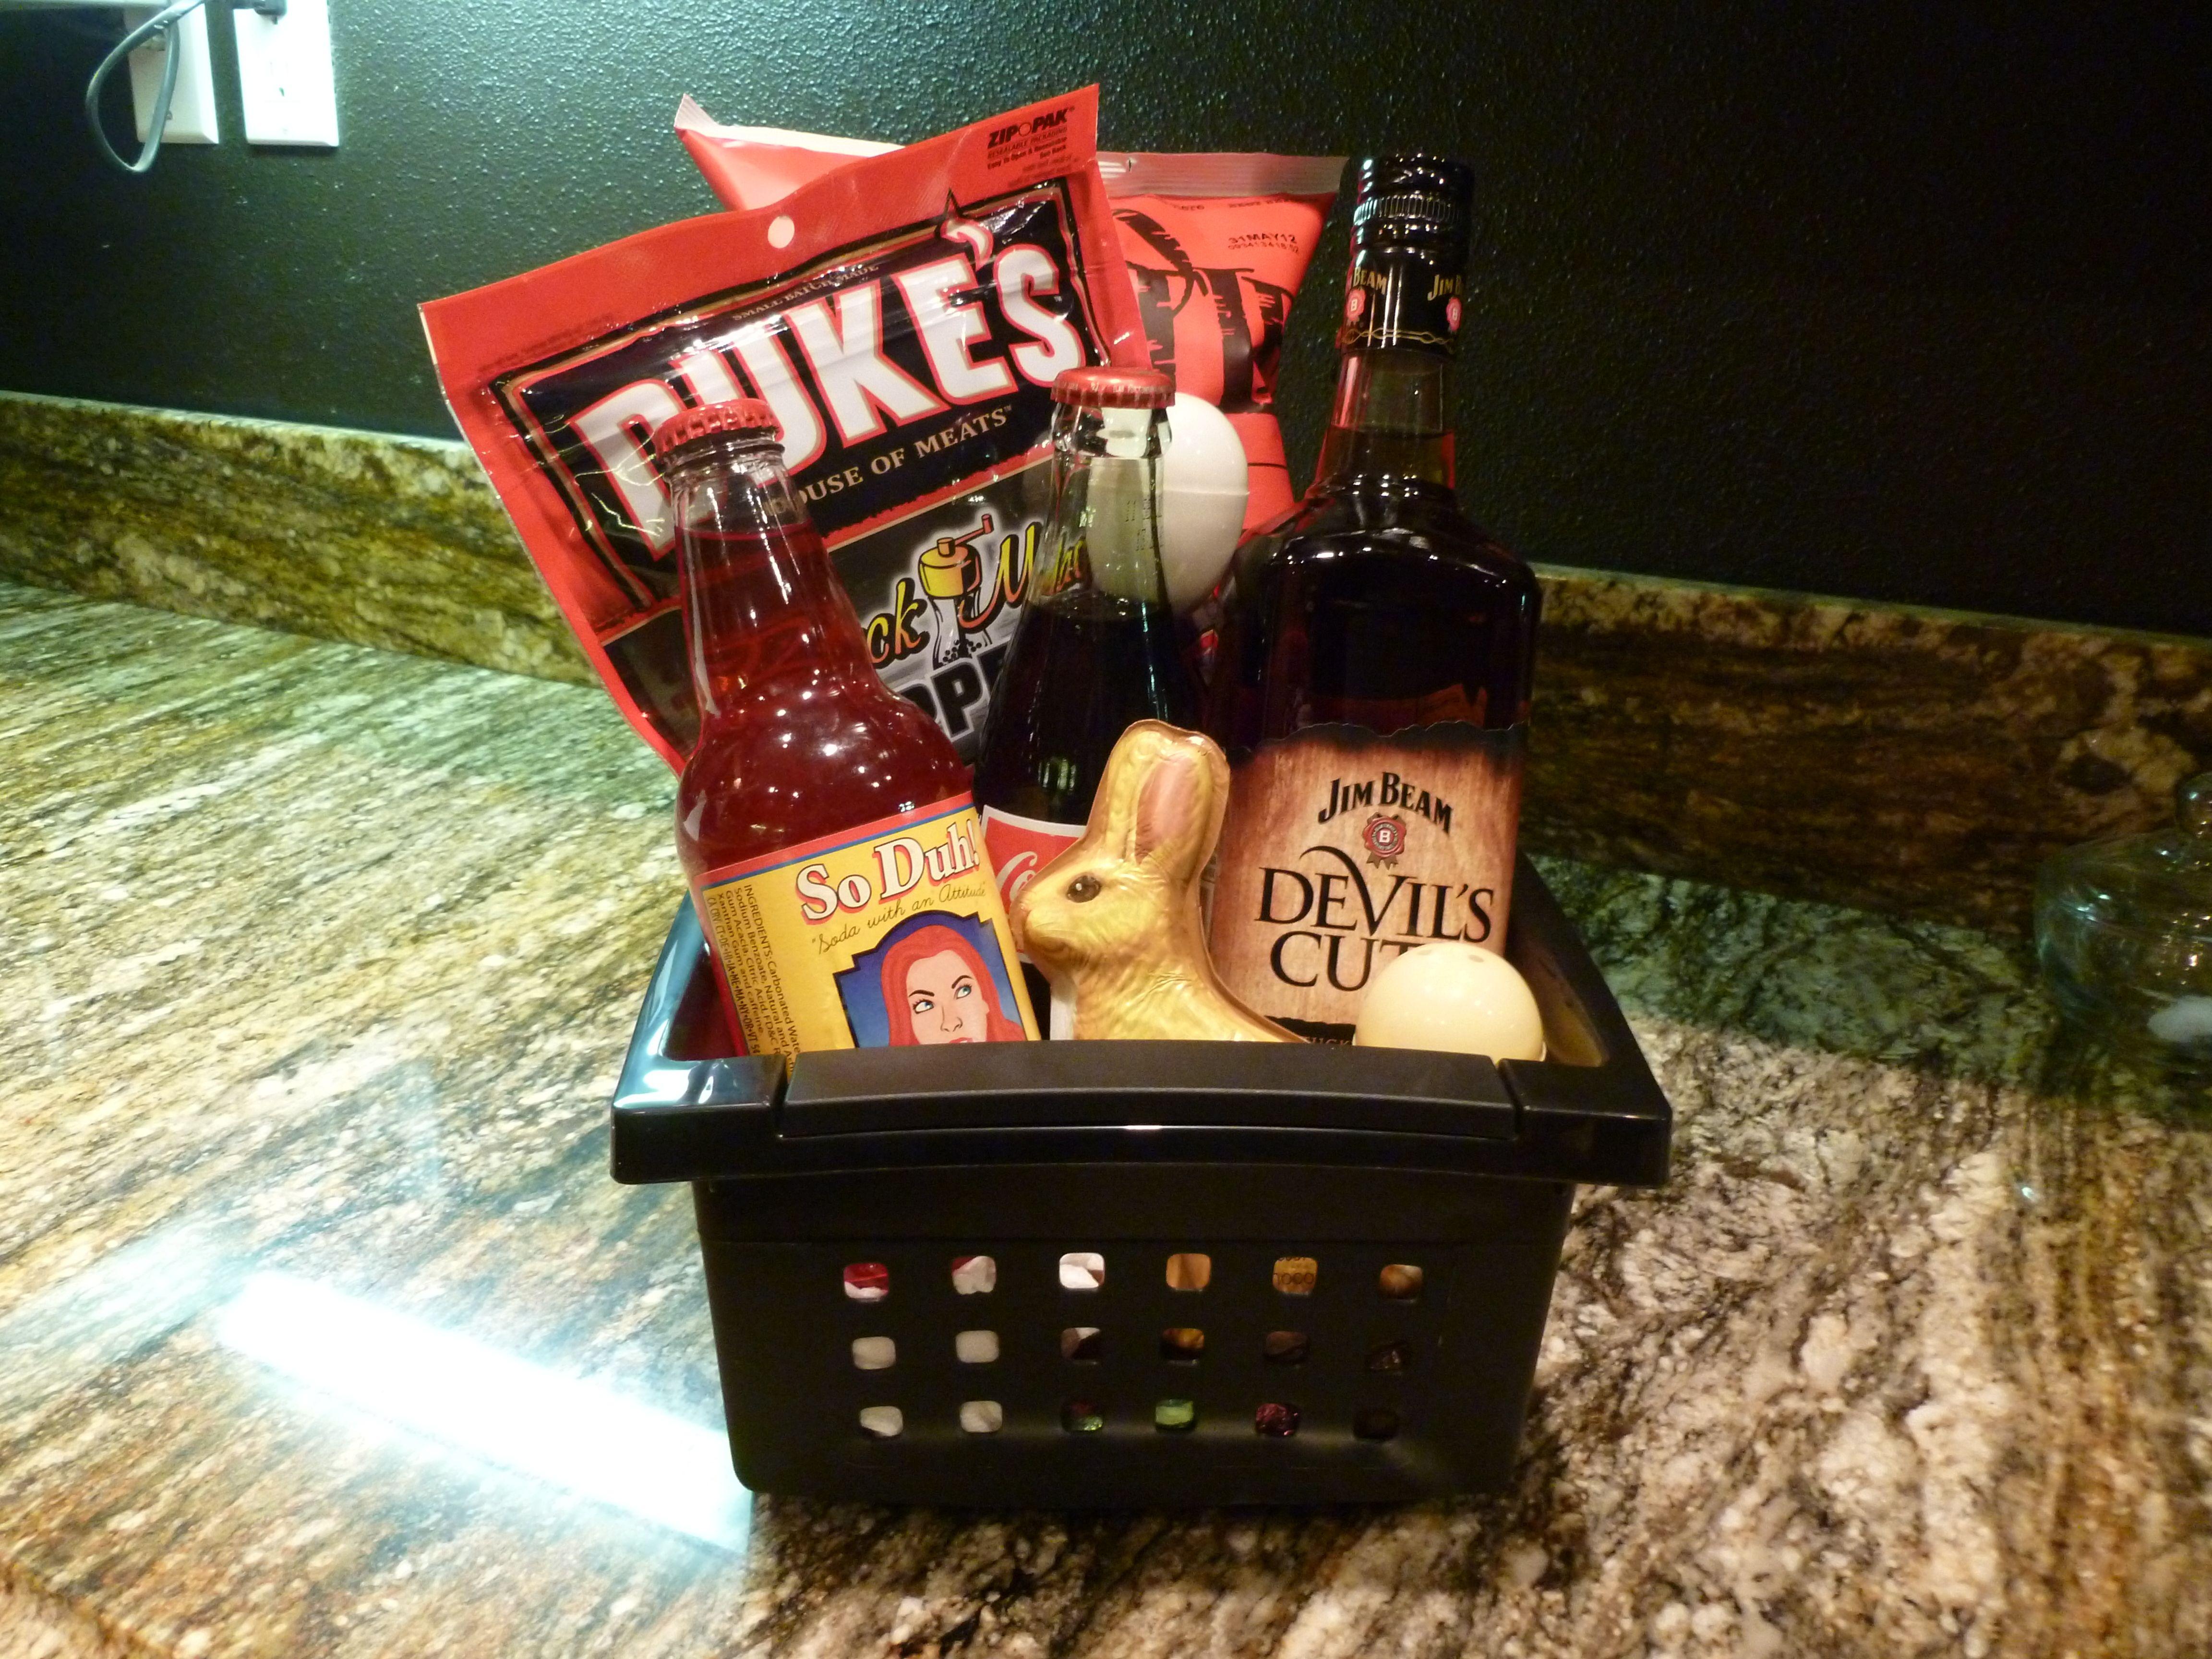 Whiskey adult gift basket gift baskets pinterest gift basket whiskey adult gift basket negle Gallery